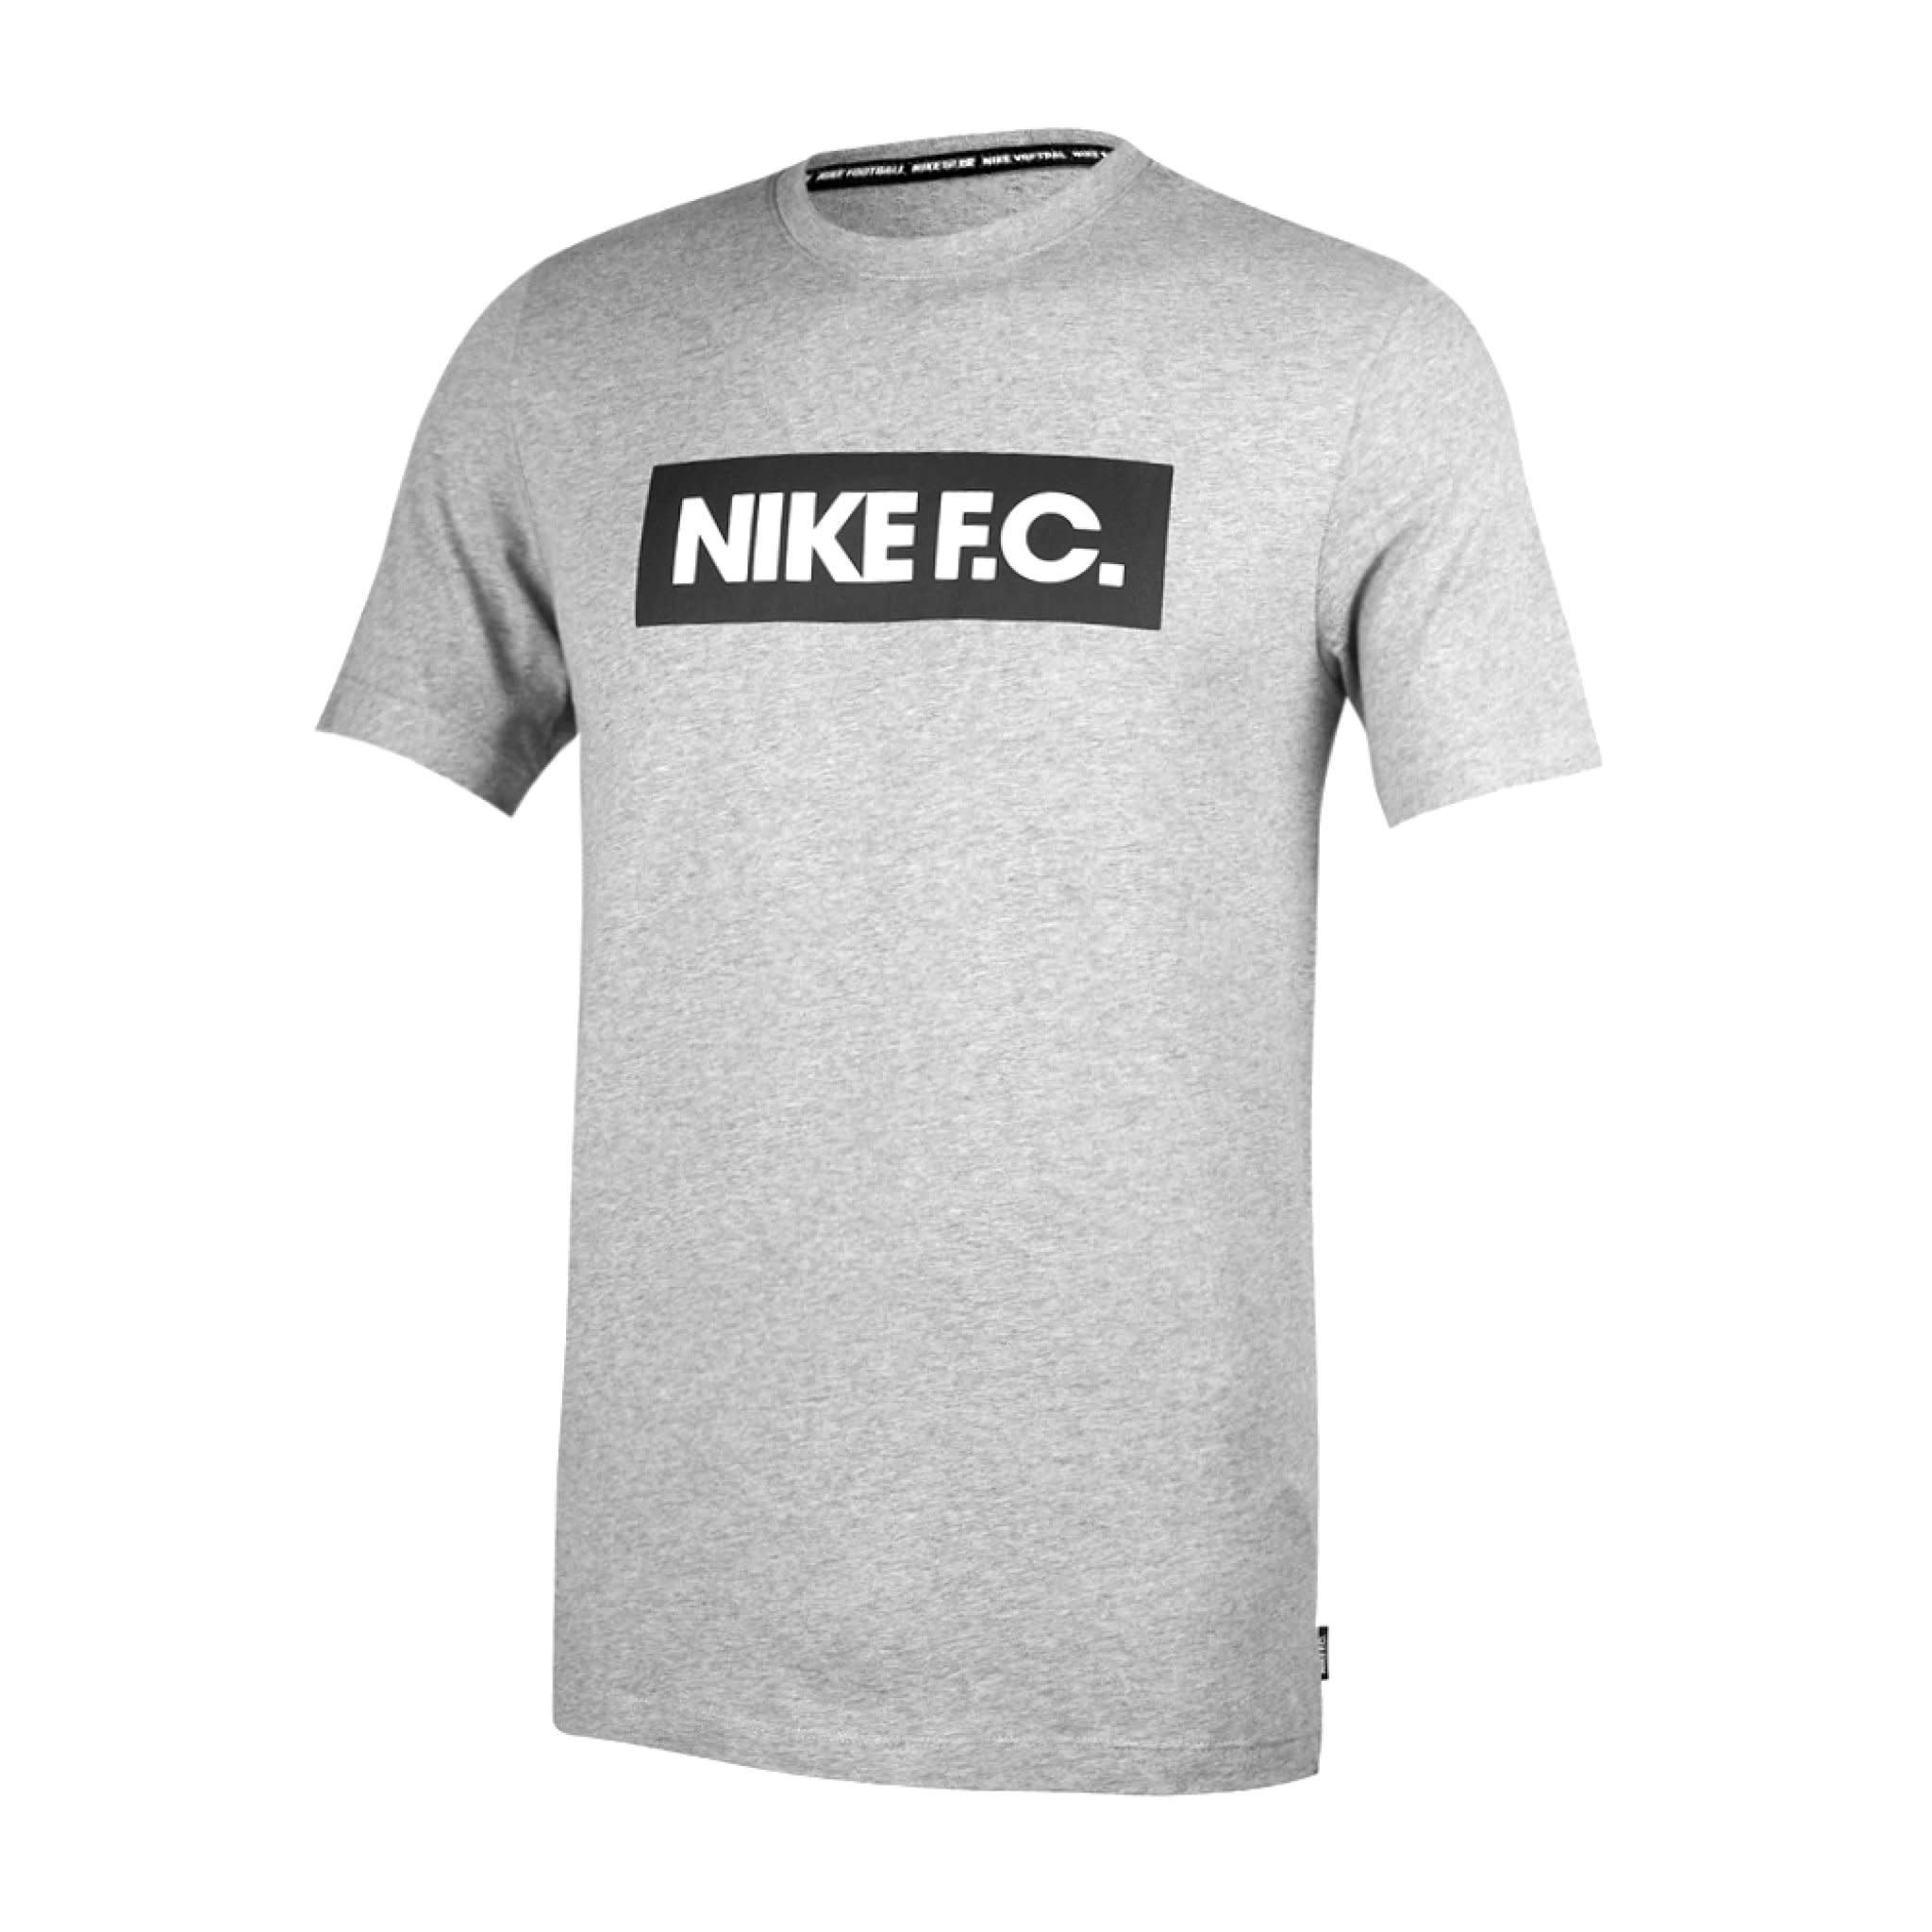 Nike Nike F.C. T-Shirt